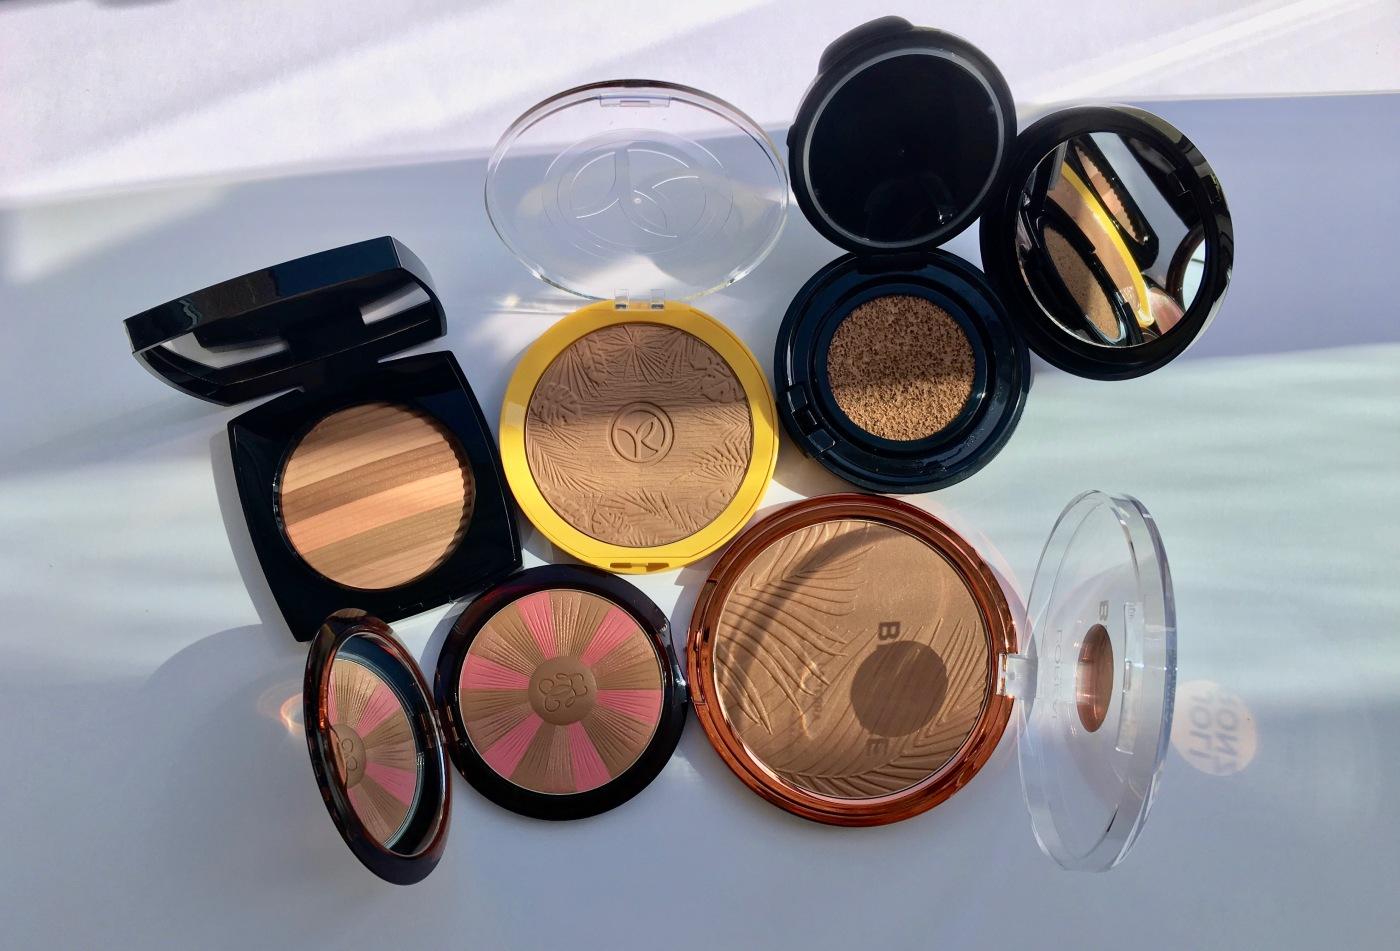 bronzing powder terracotta guerlain dior shiseido l'oréal yves rocher